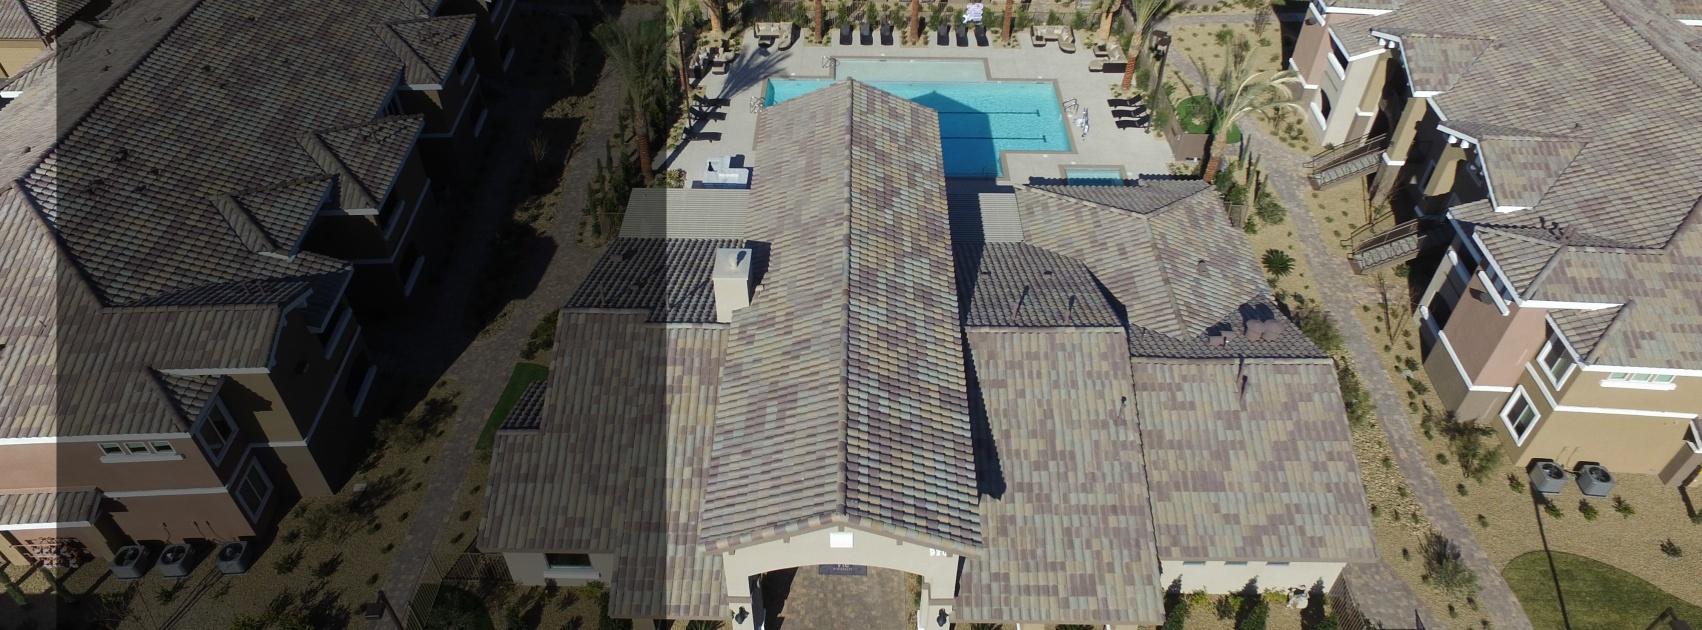 Multi-Family Residential Roofing